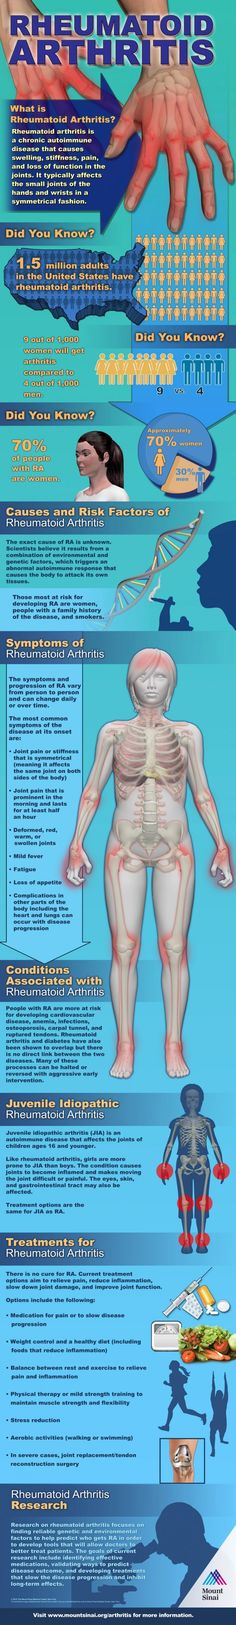 Rheumatoid Arthritis Infographic